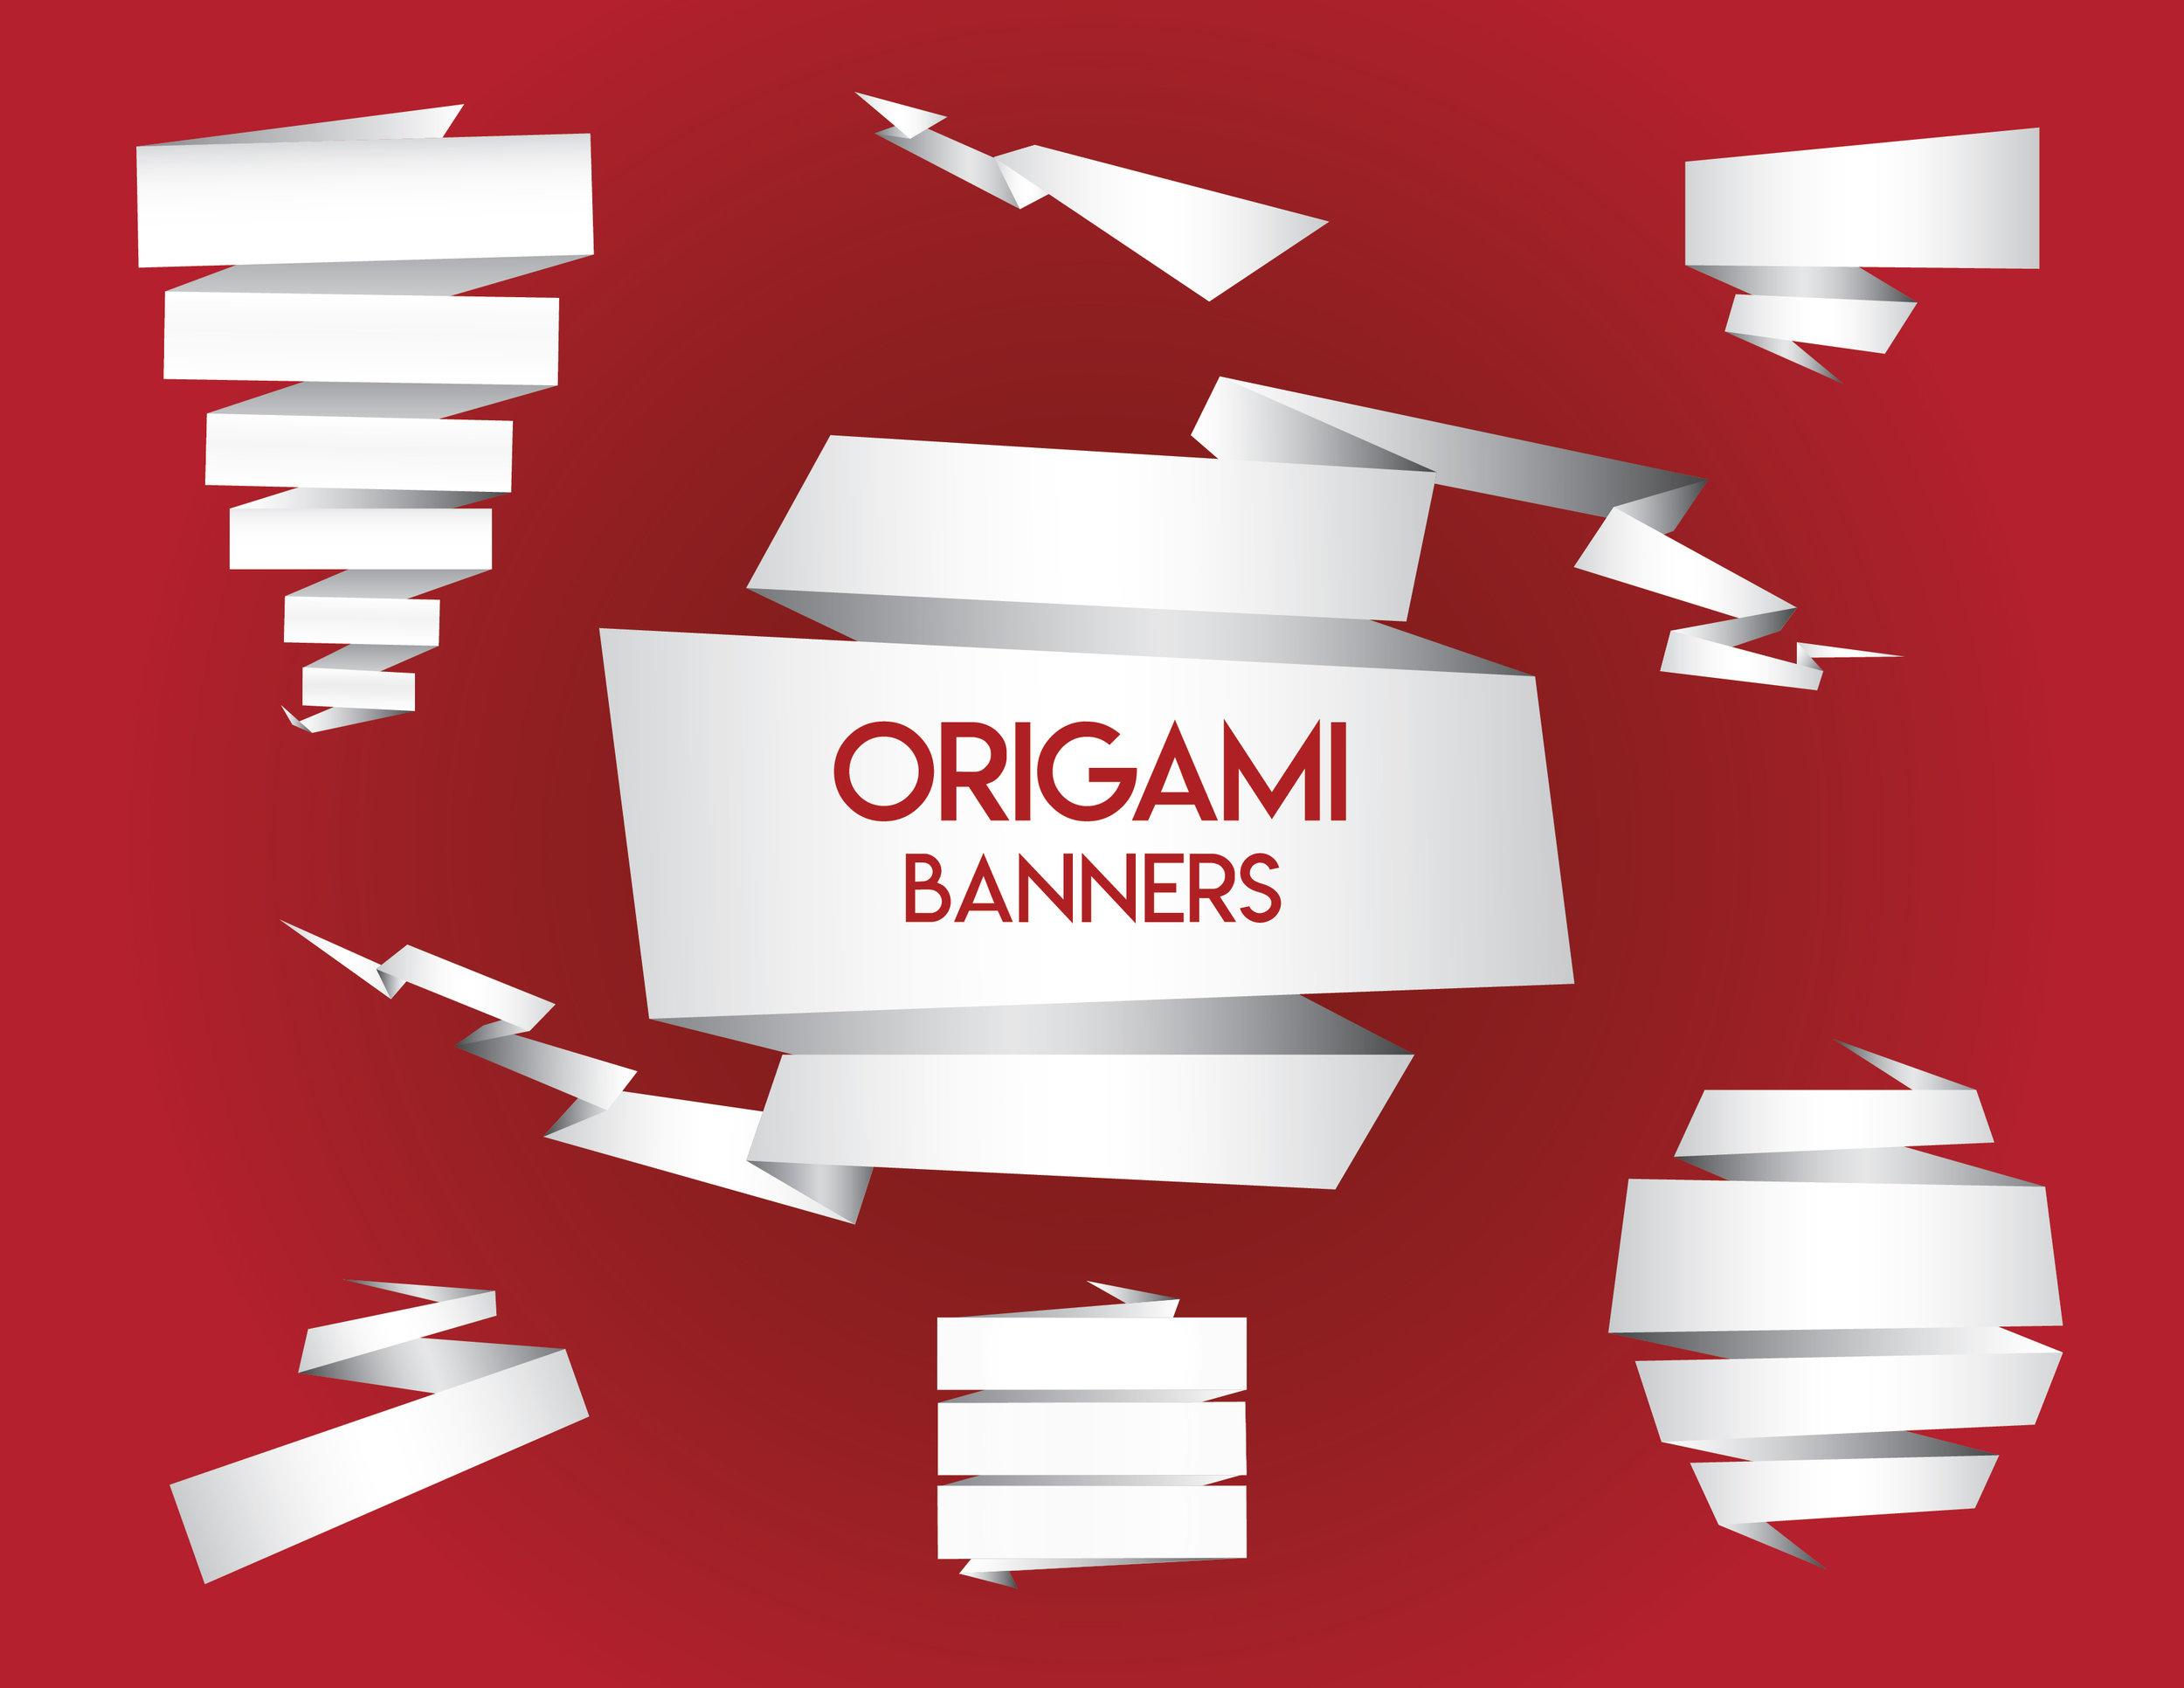 Origami-graphics-Oct2018-01.jpg